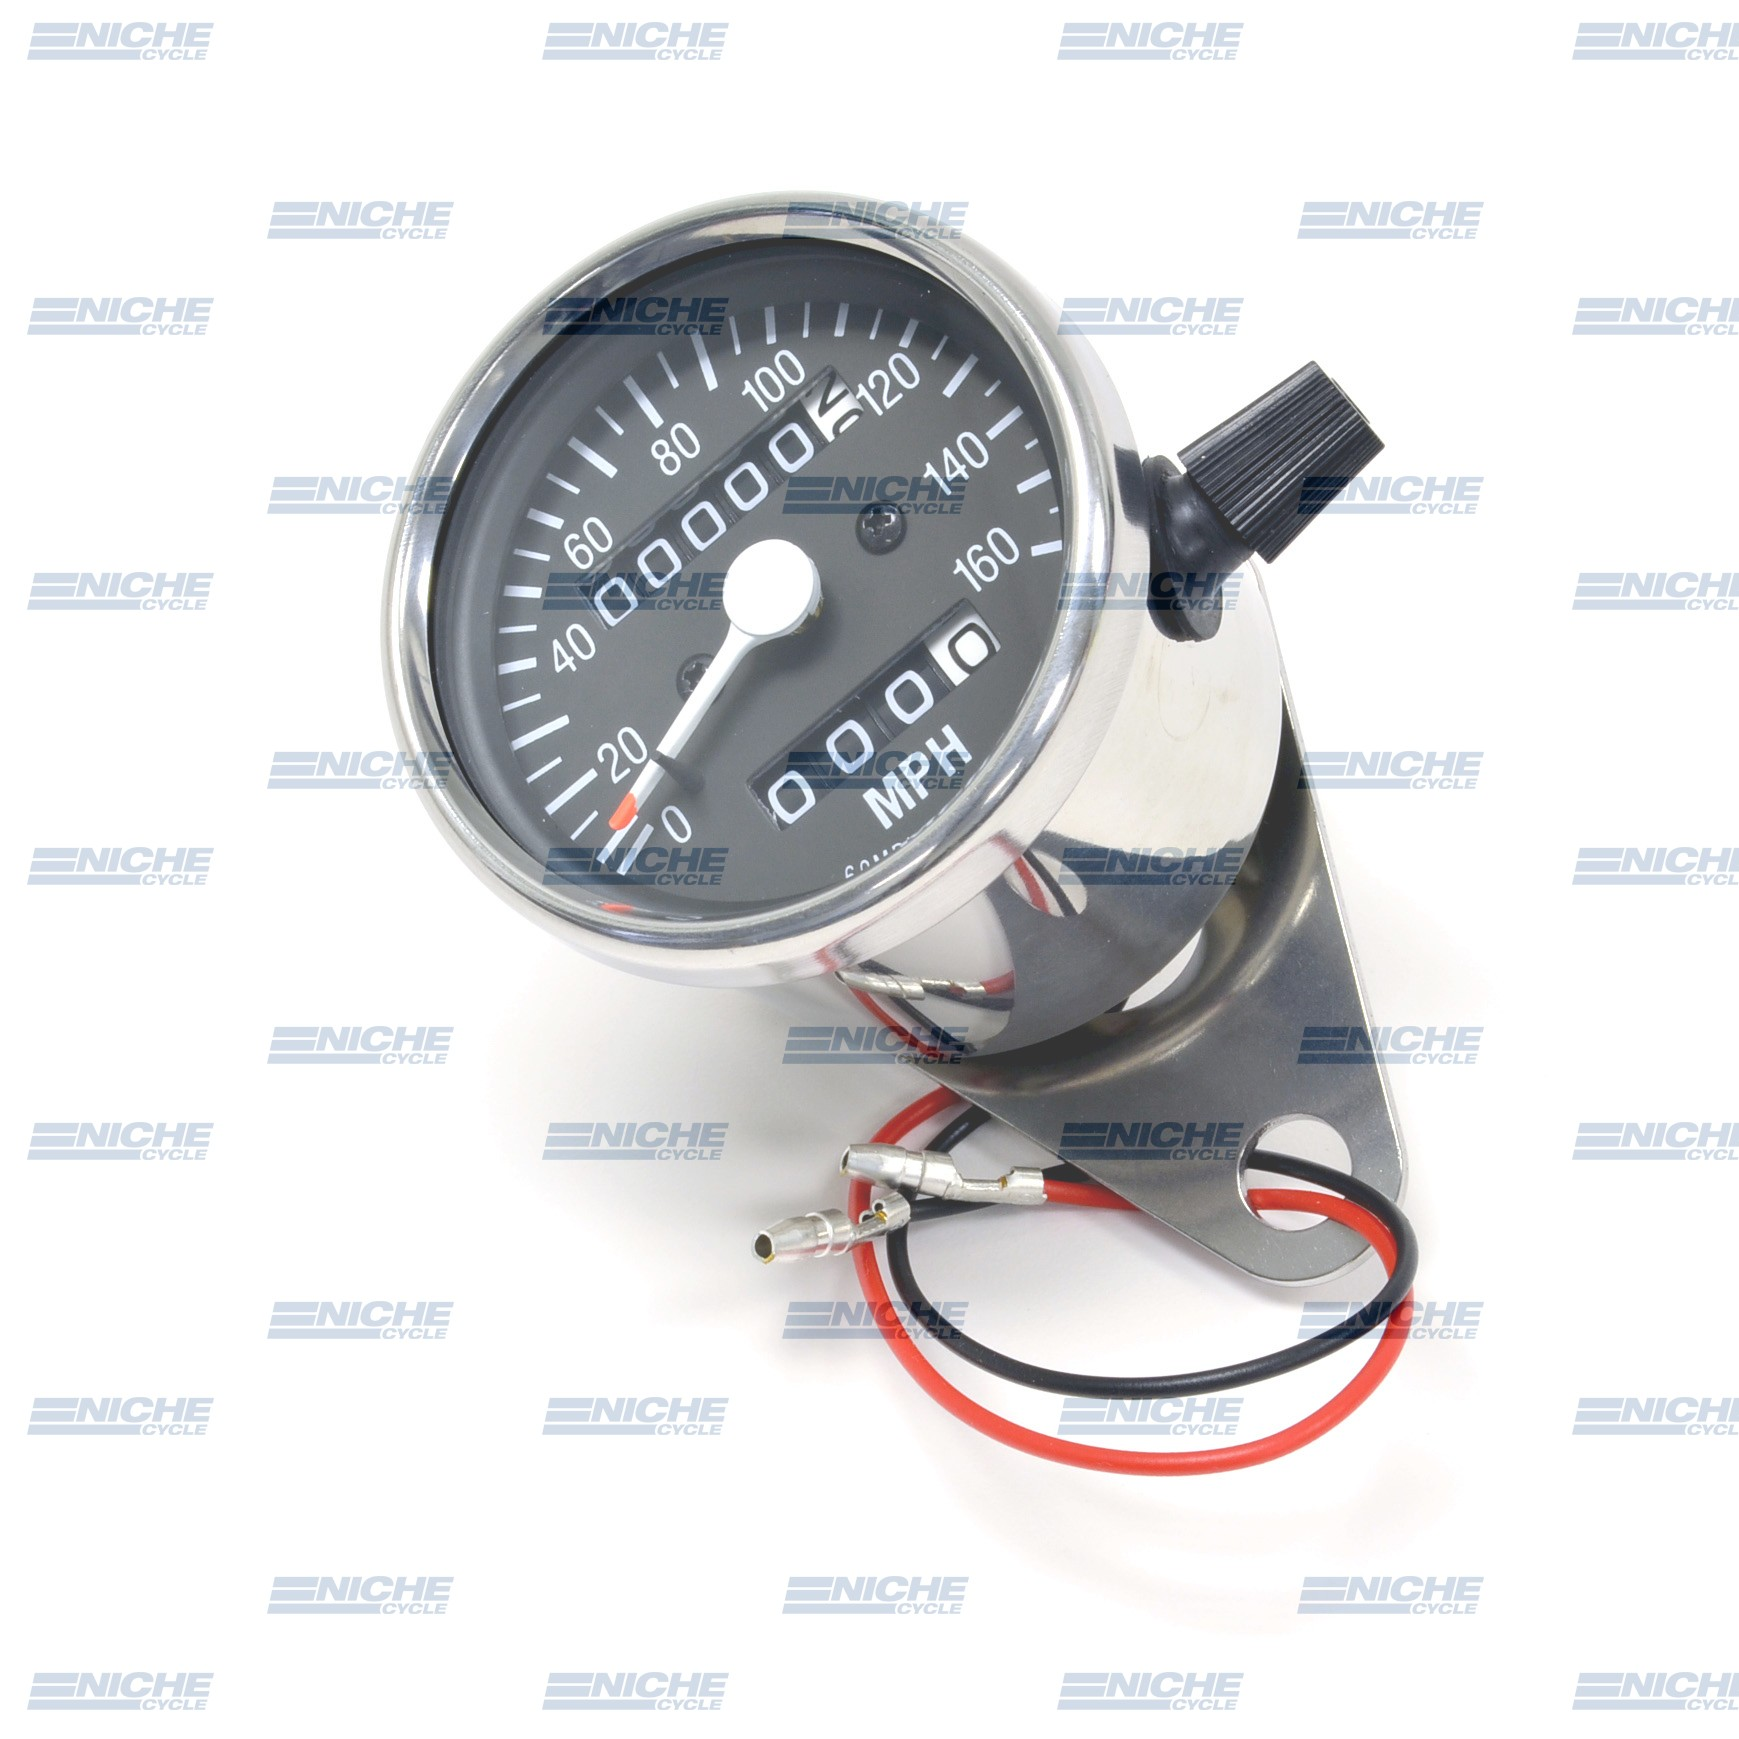 Mini Speedometer Gauge 160 MPH - 2.1:1 Ratio 58-43664